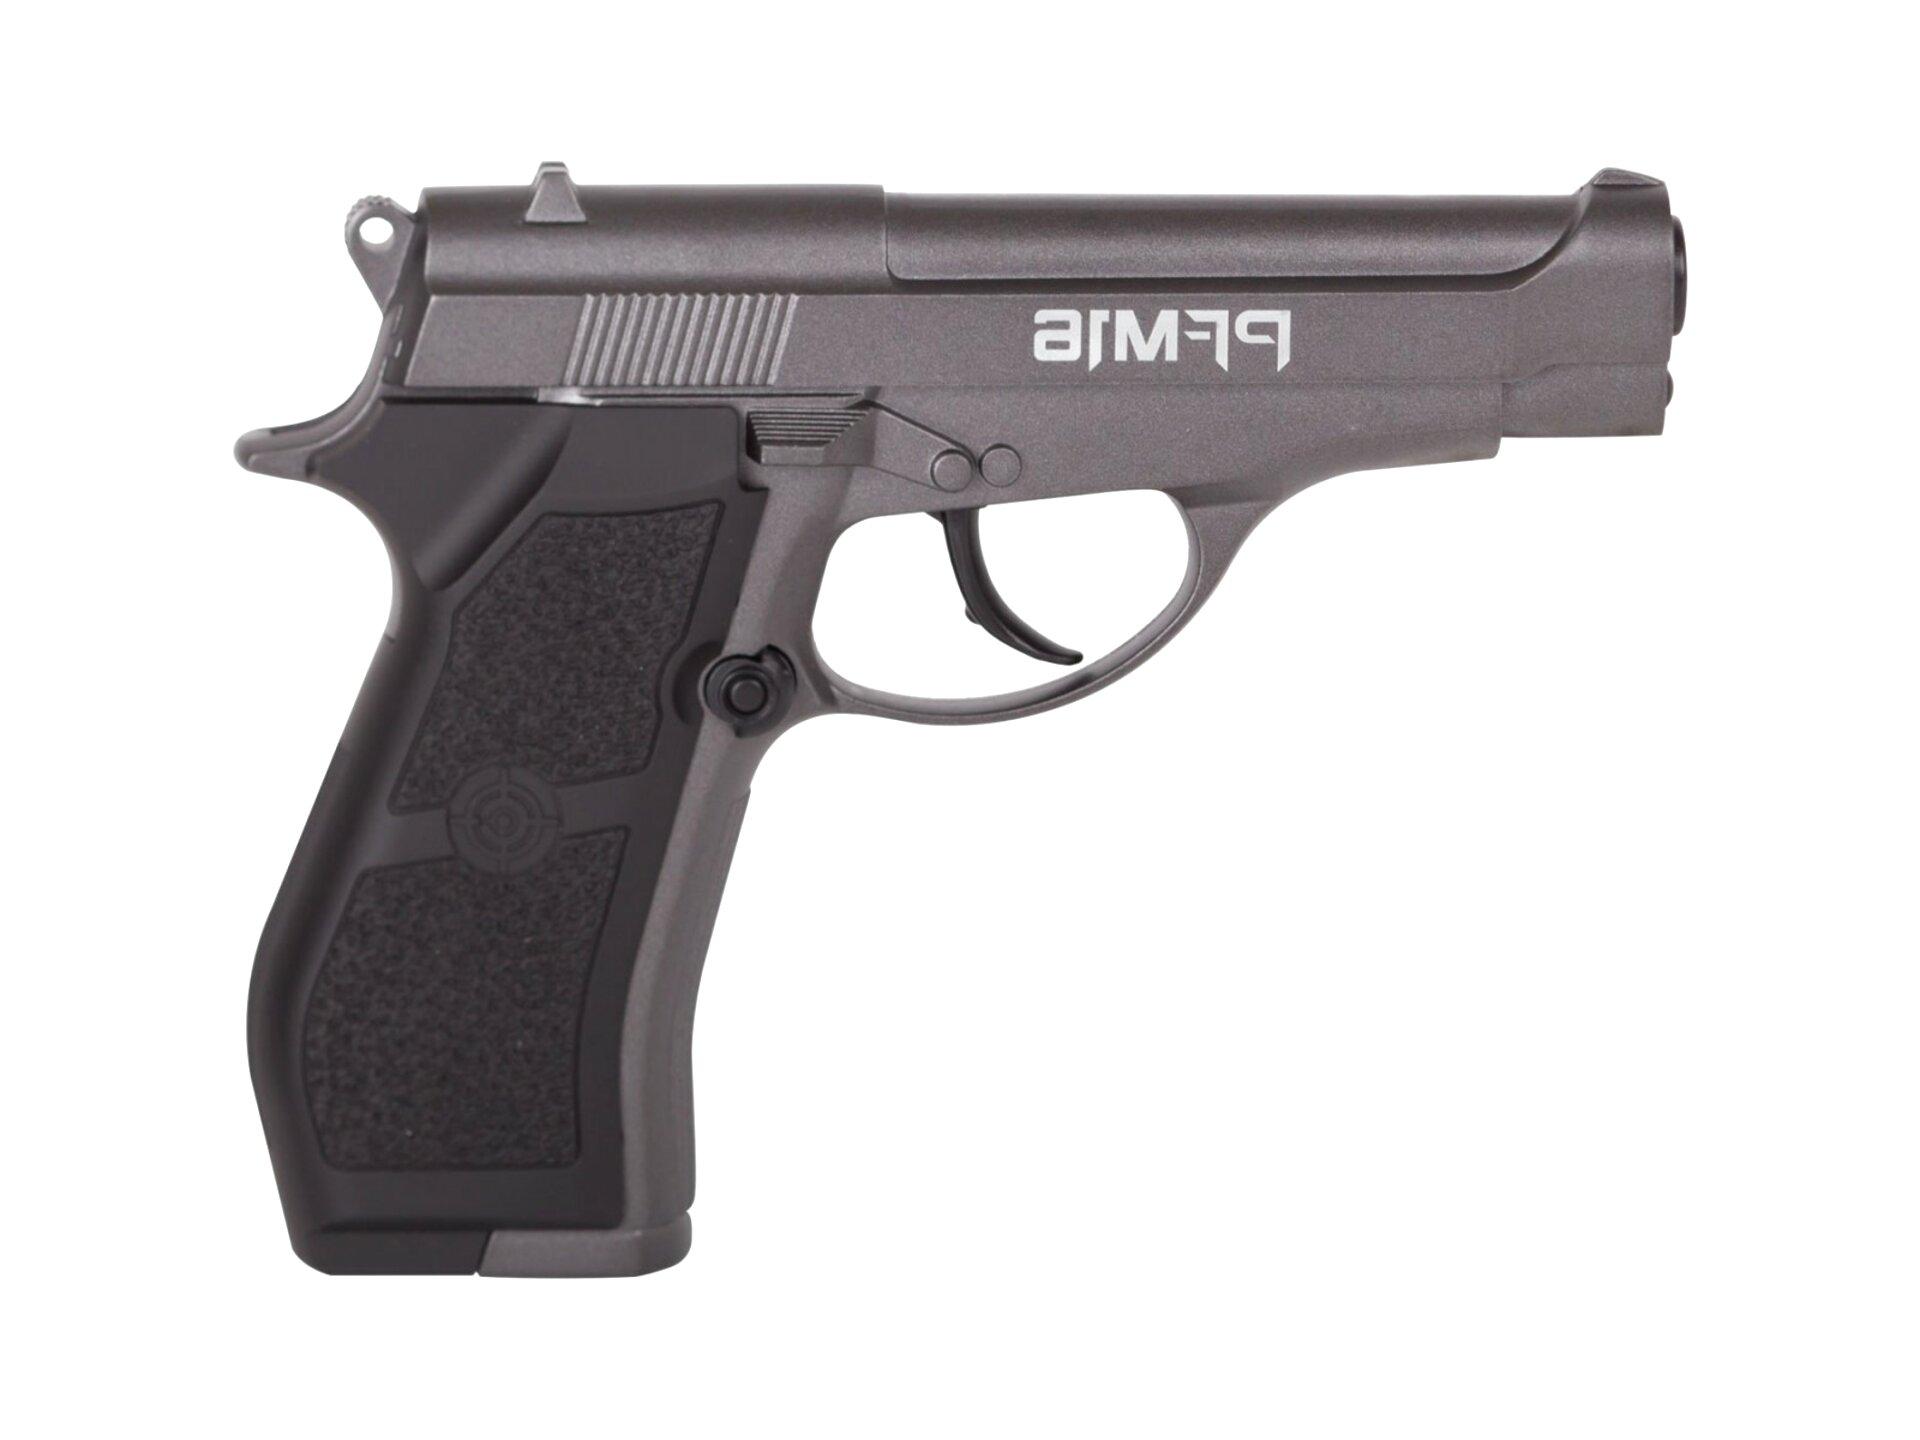 metal bb gun for sale